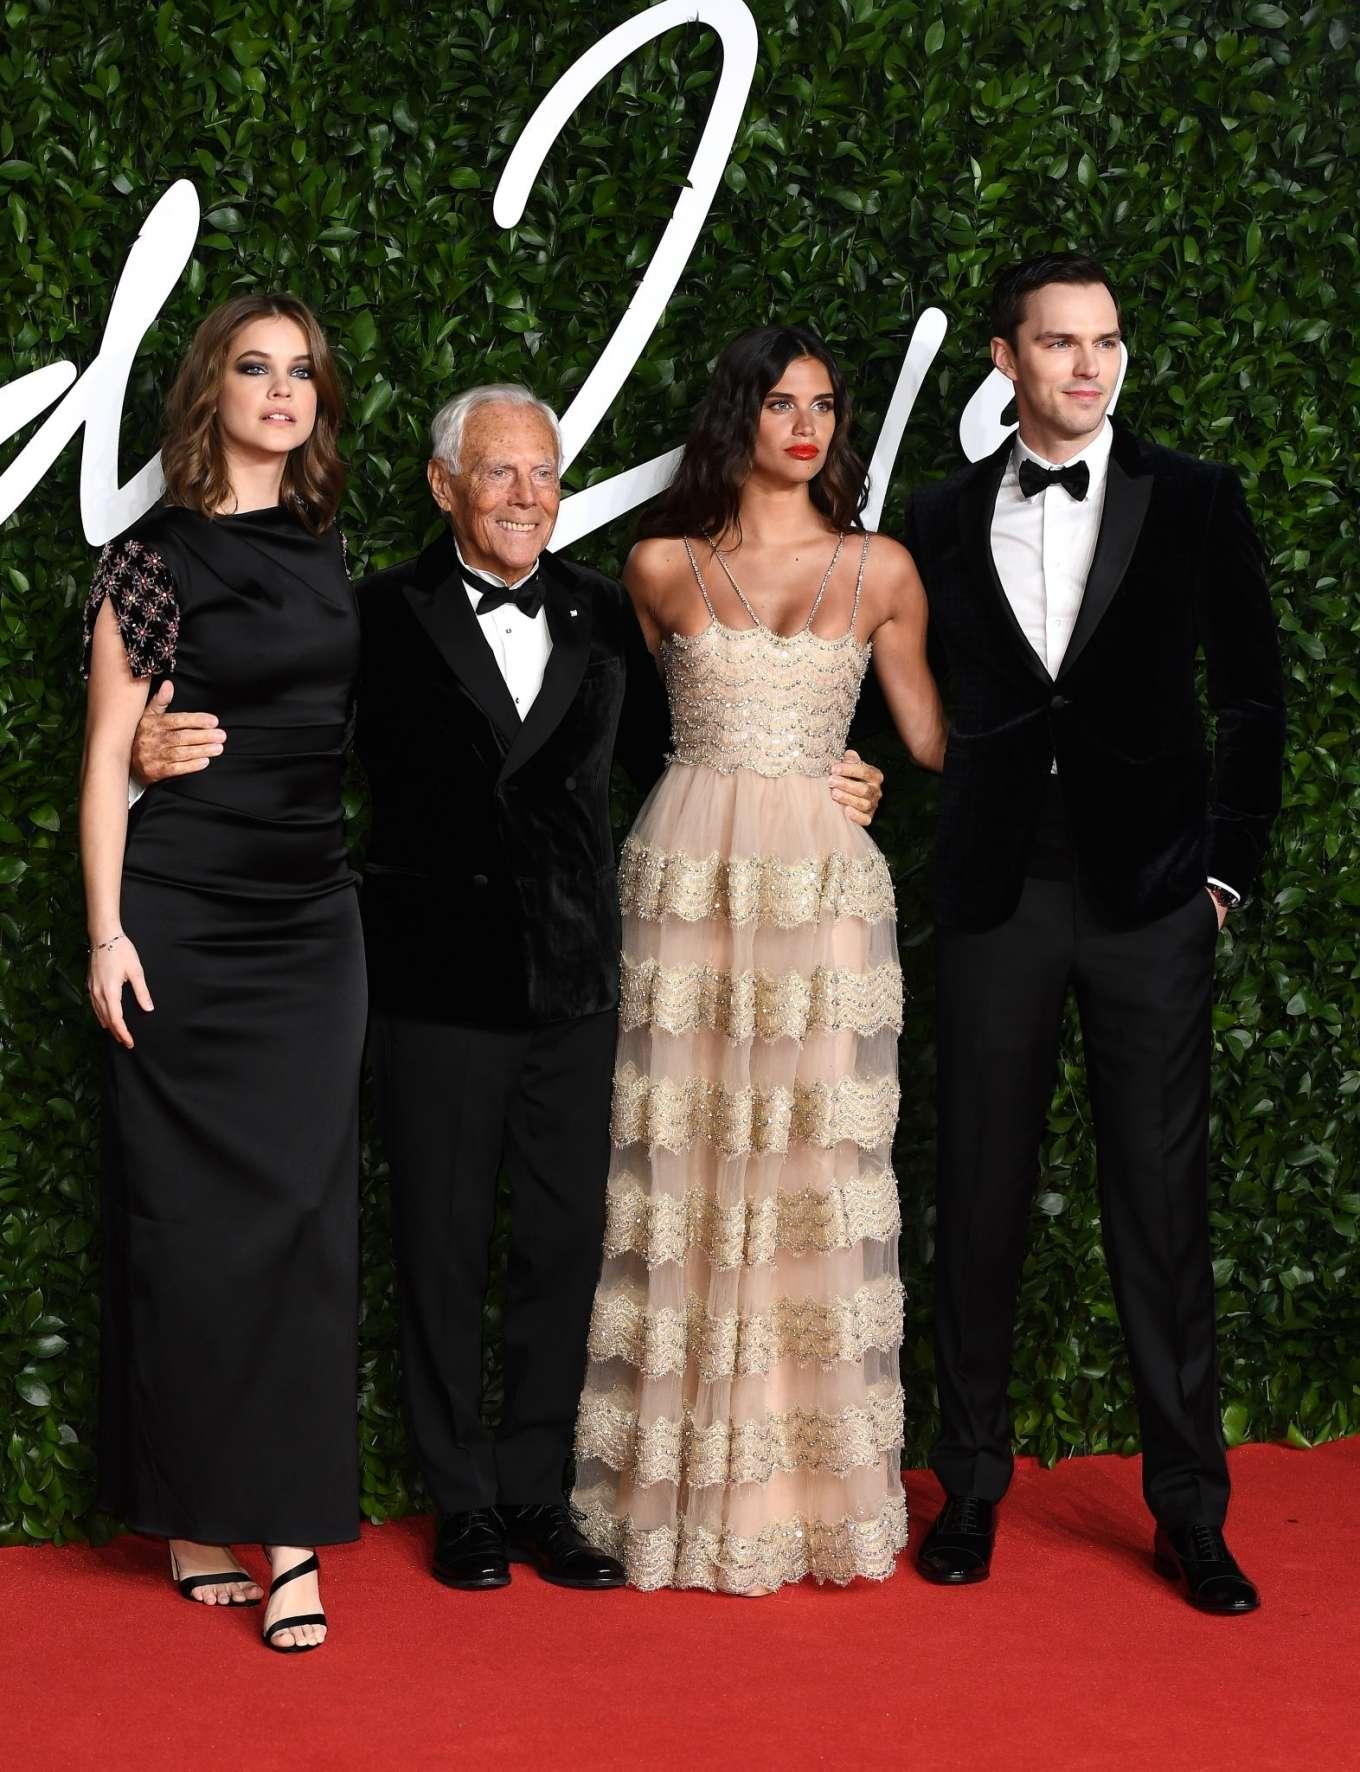 Sara Sampaio 2019 : Sara Sampaio – Fashion Awards 2019 in London-16